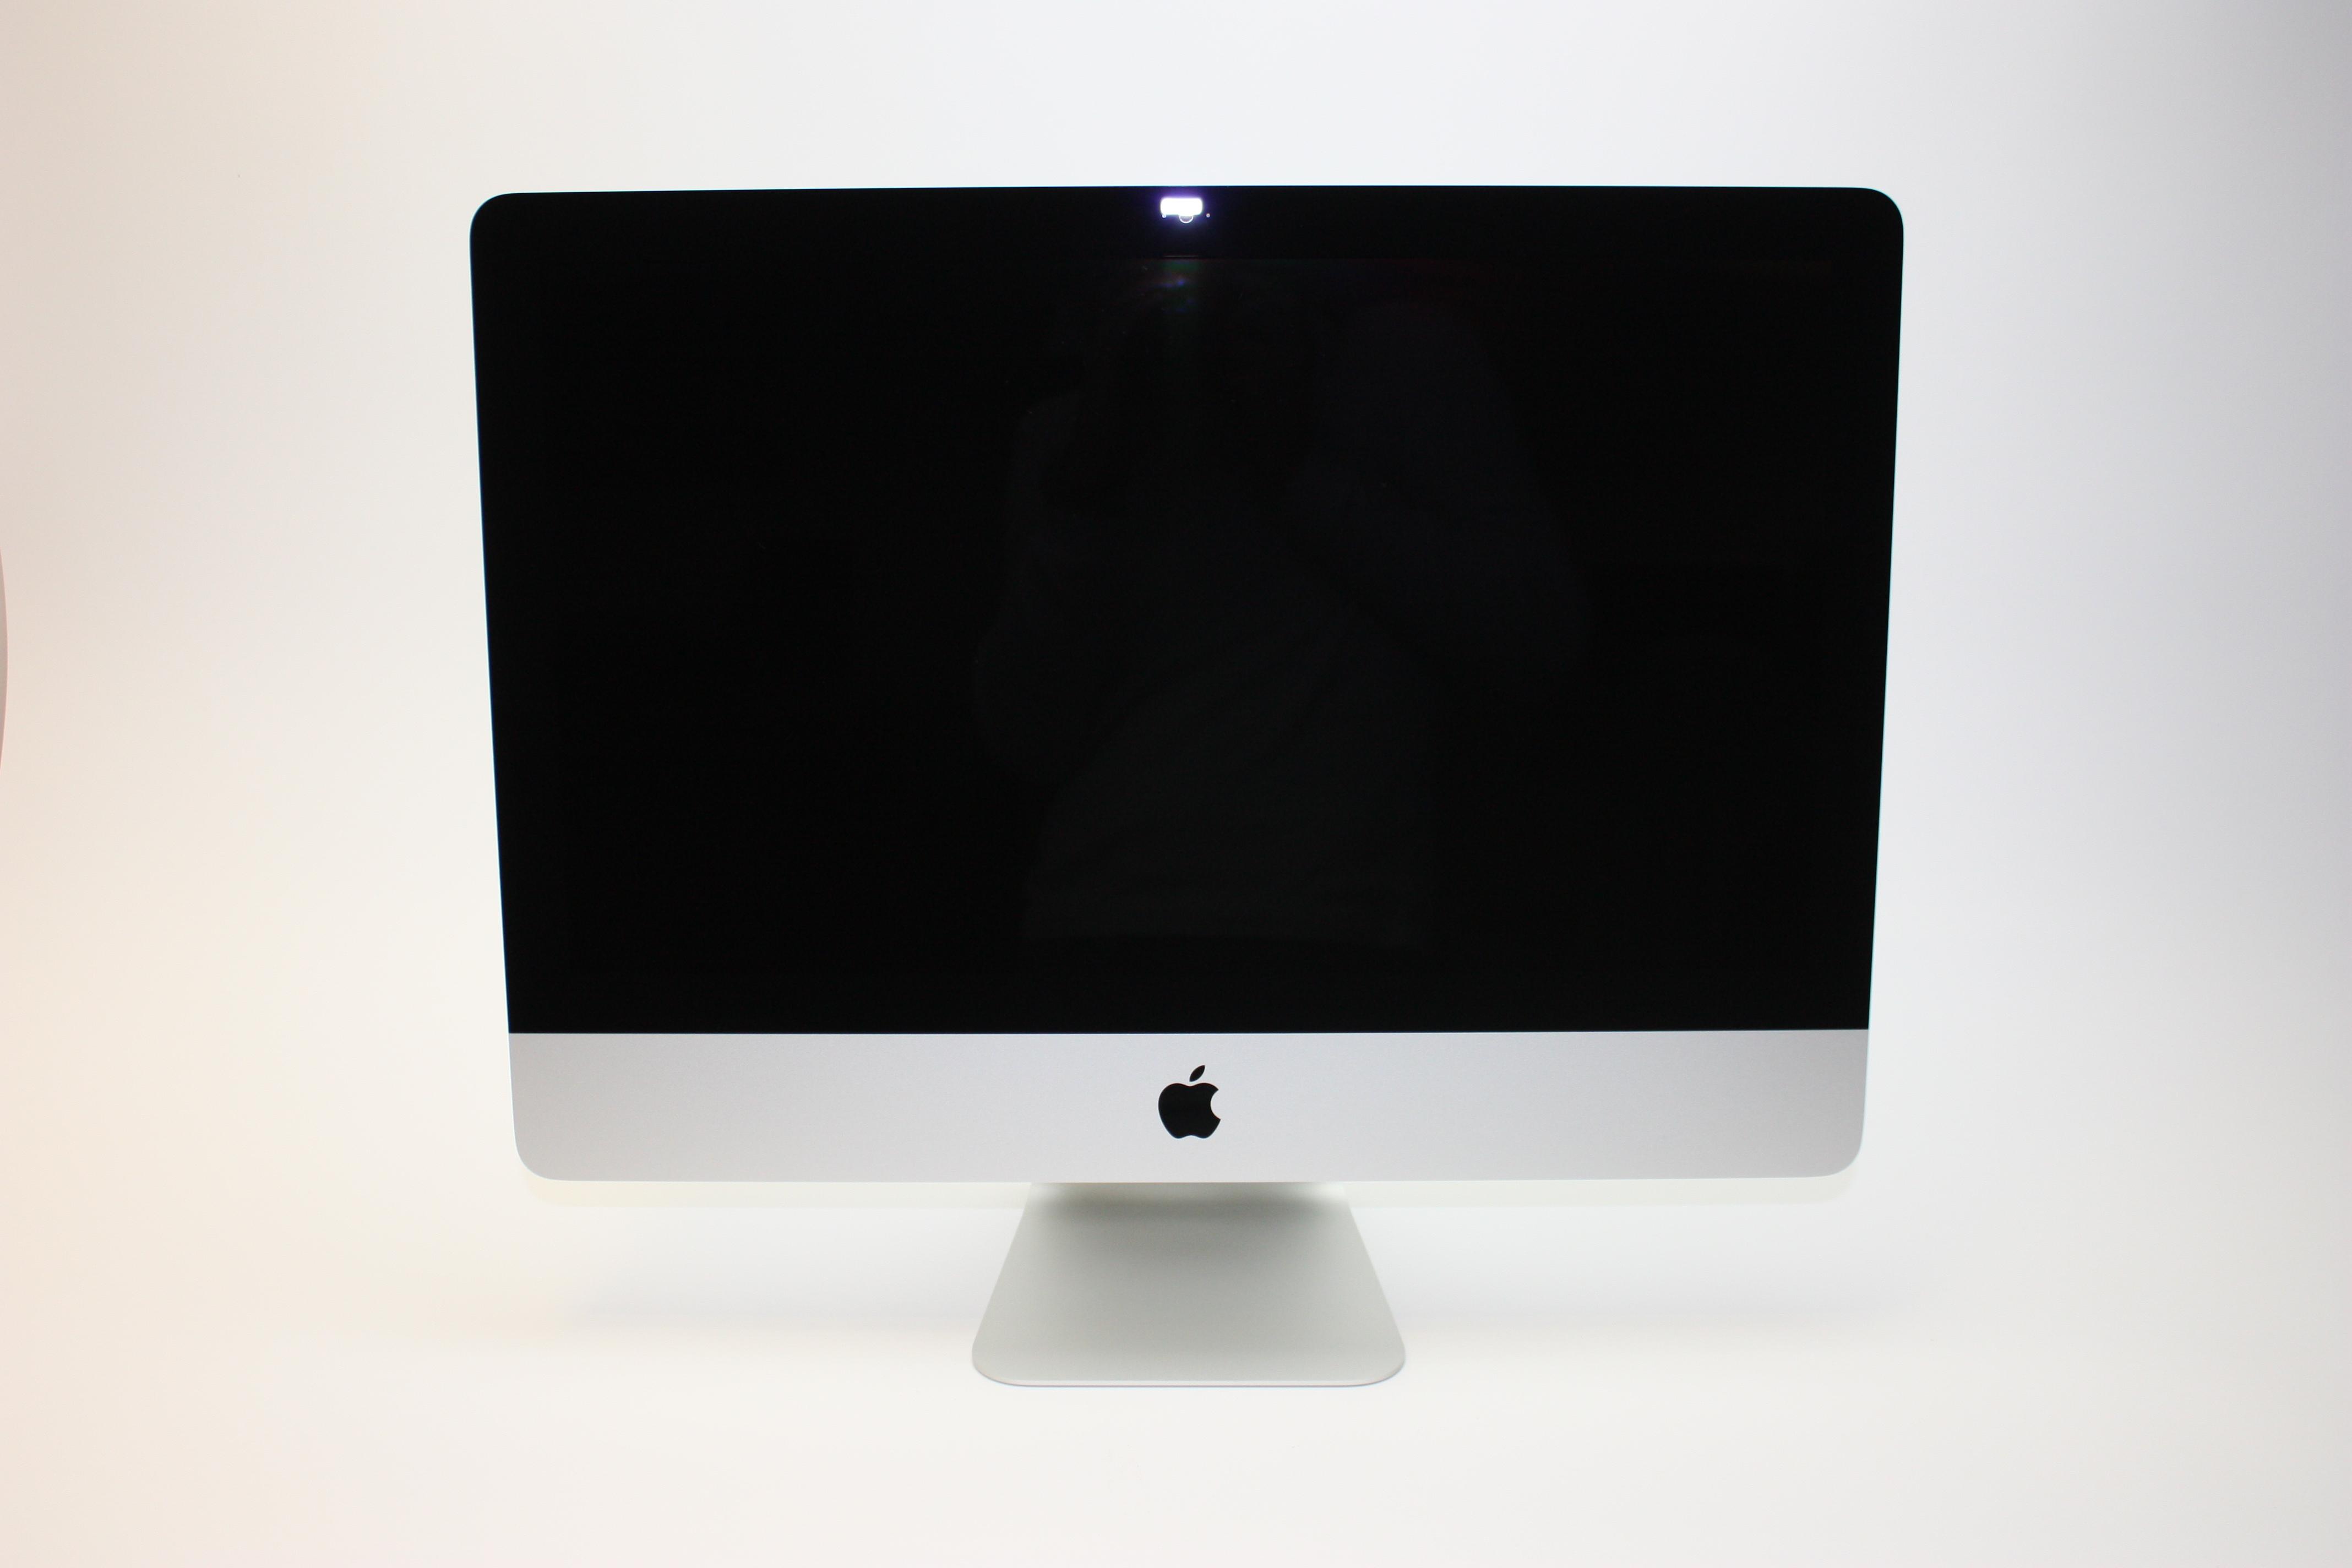 iMac Retina 4K 21.5-inch, 3.0 GHz Core i5, 8 GB 2400 MHz DDR4, 1 TB SATA Disk, image 1